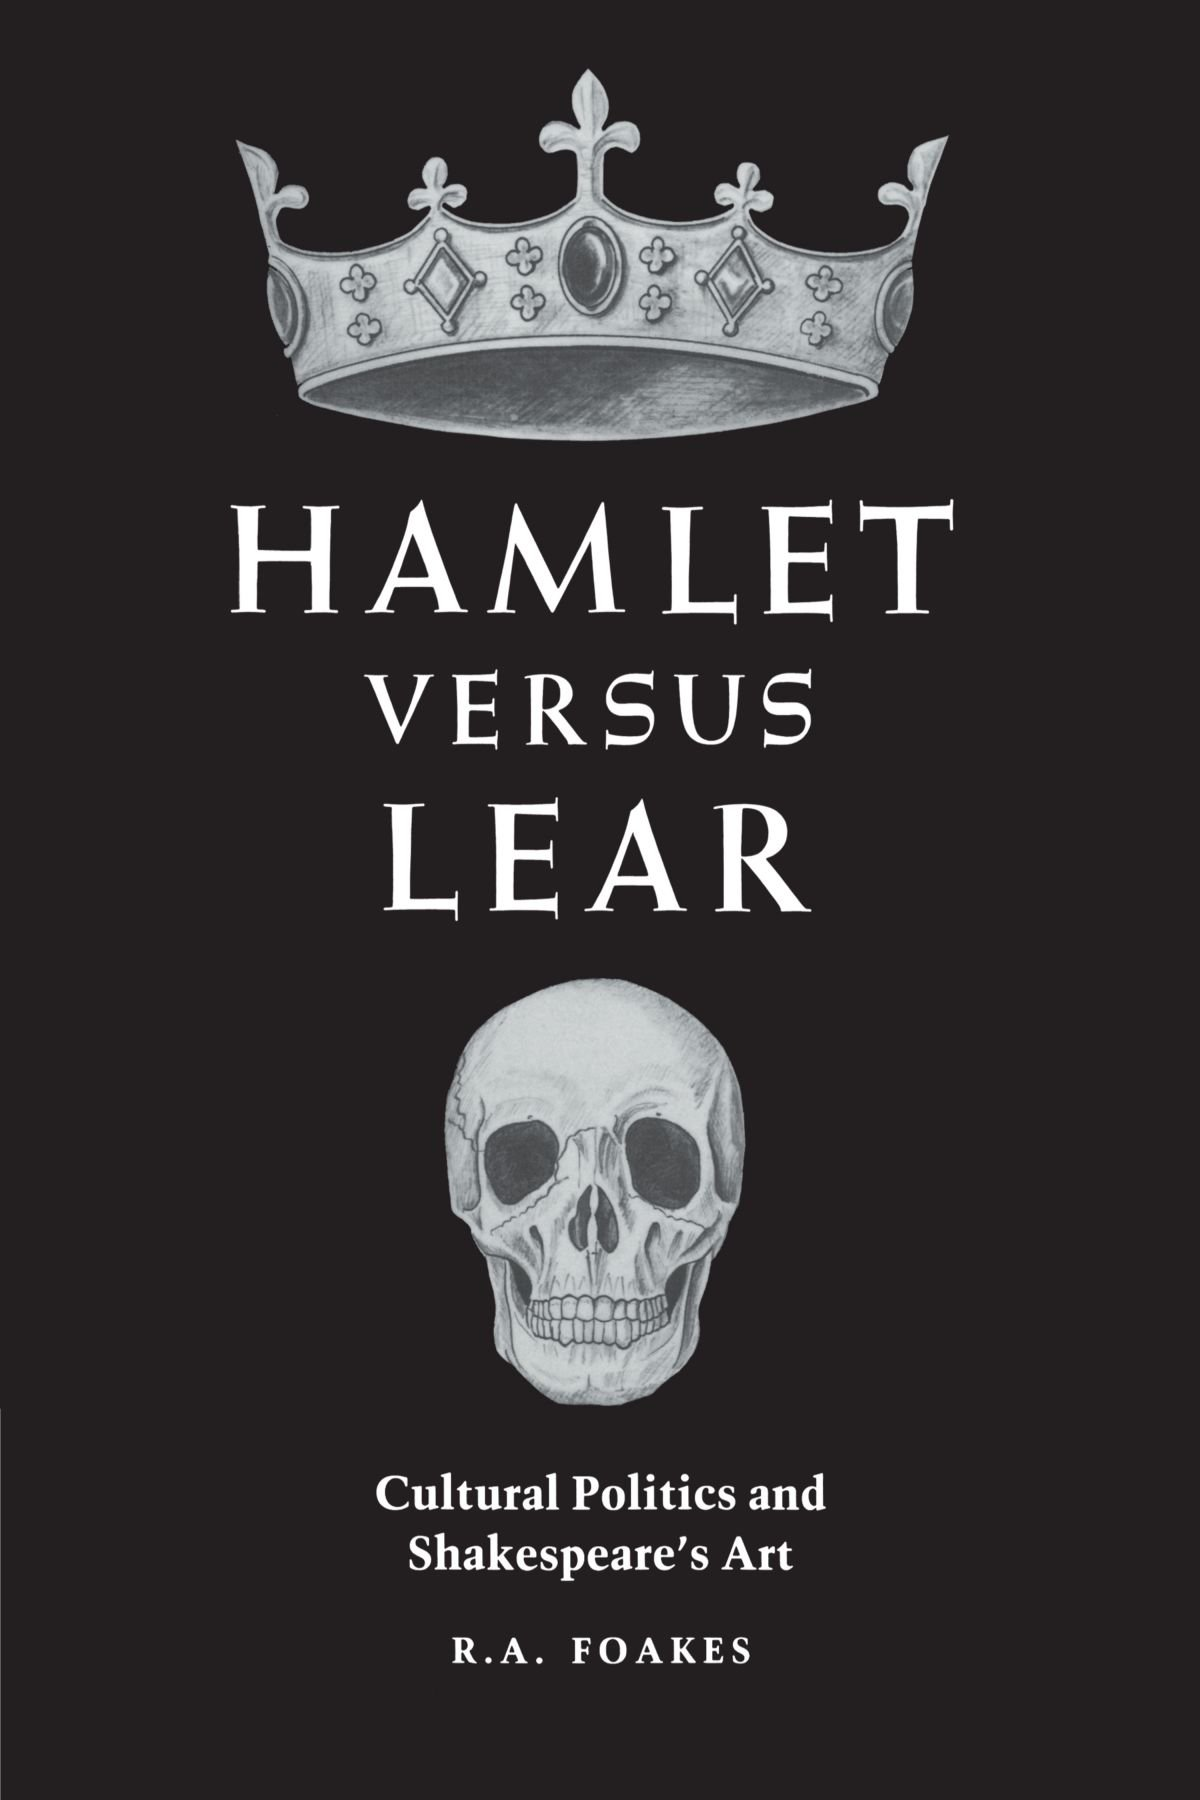 Hamlet versus Lear: Cultural Politics and Shakespeare's Art PDF